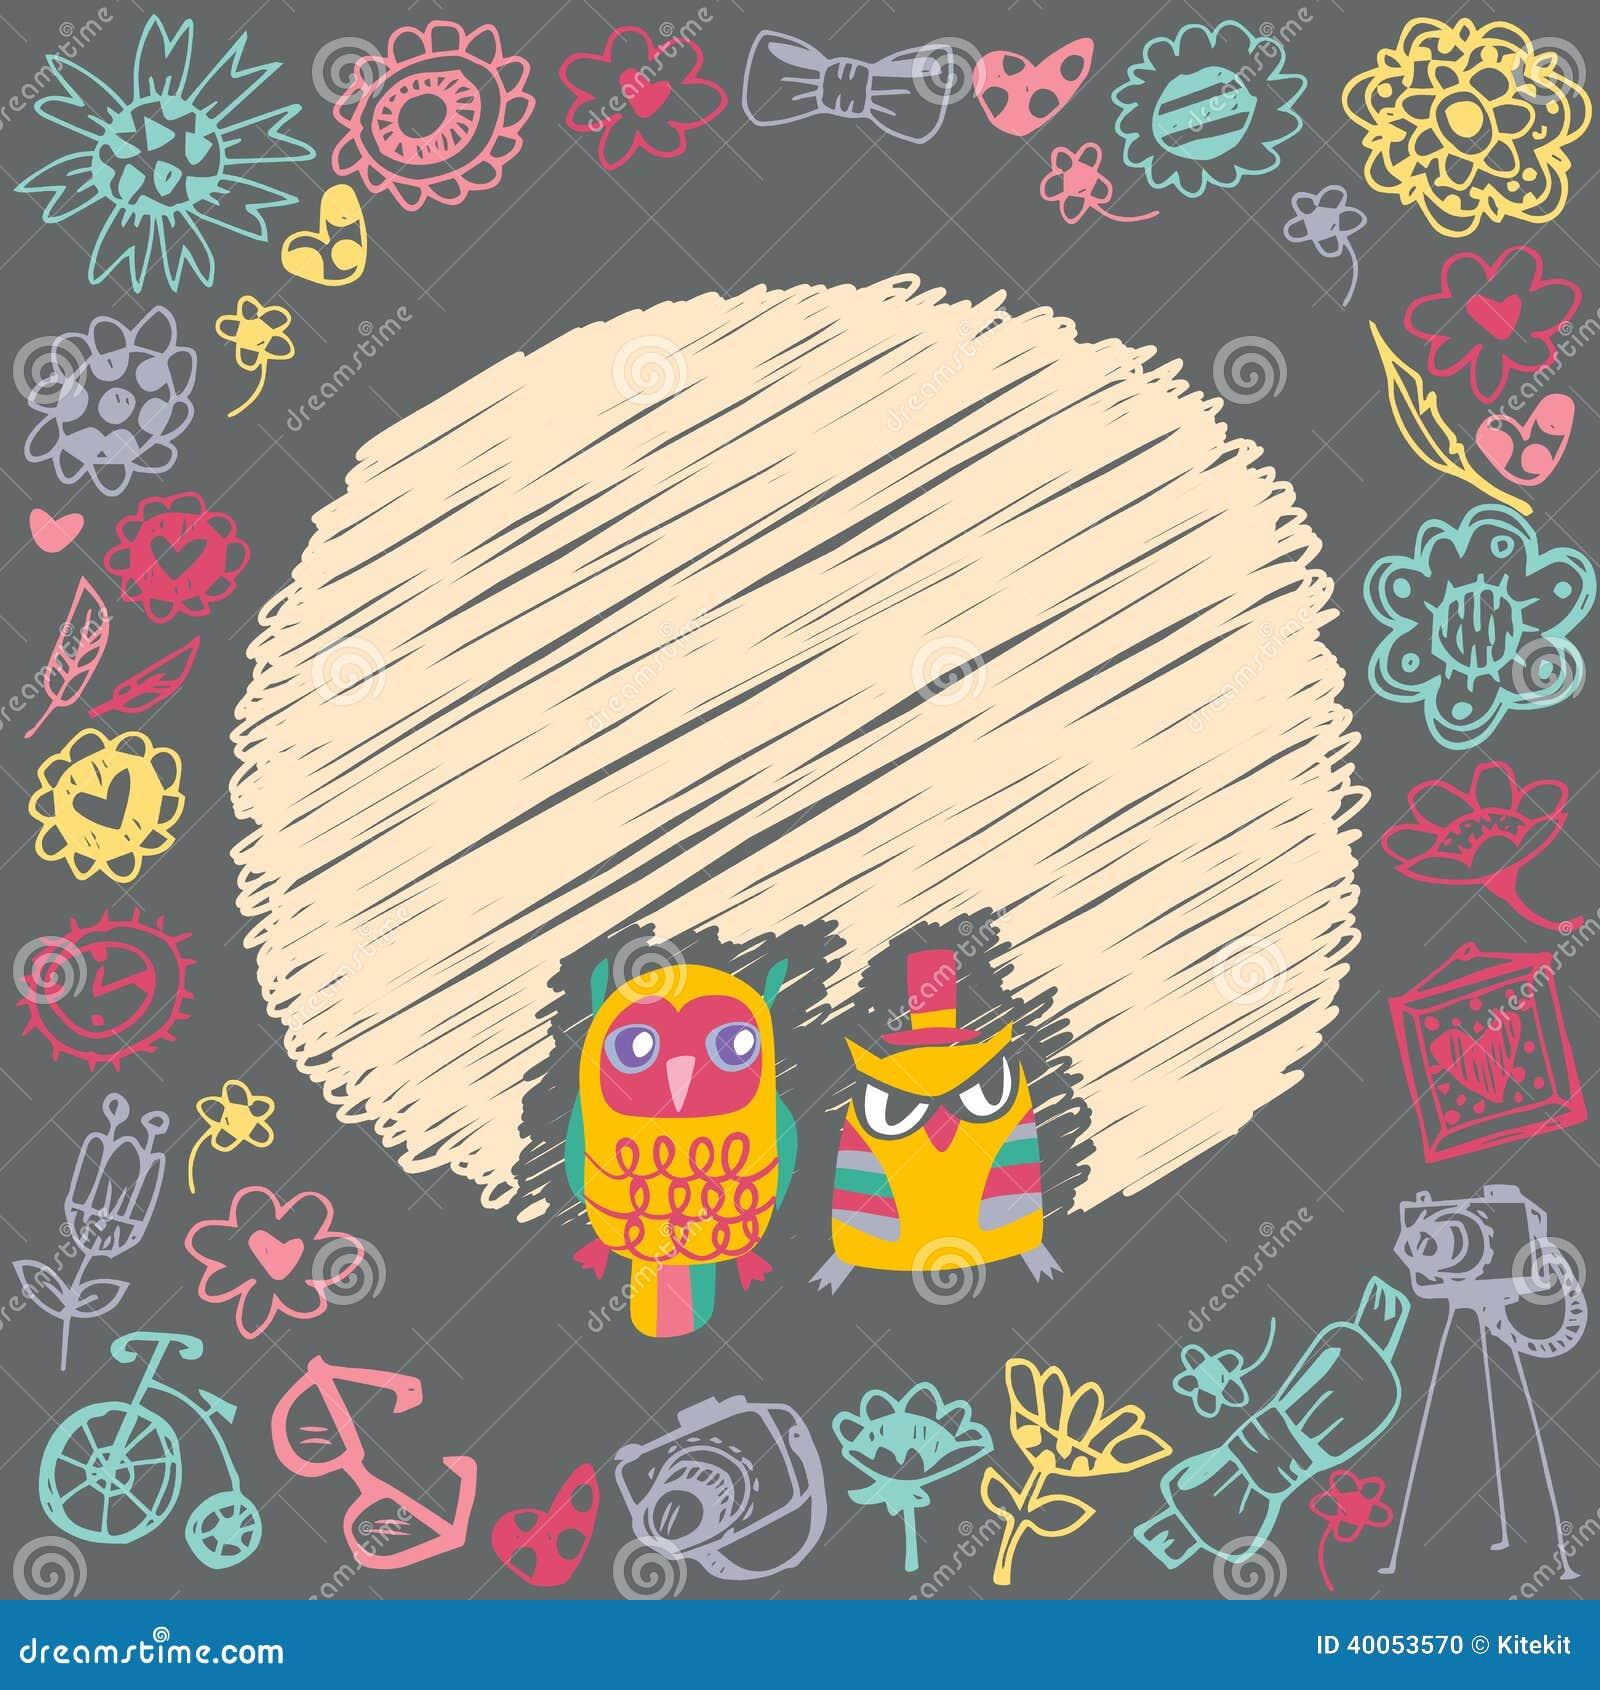 Birthday Card Designs 35 Funny Cute Examples: Owls Cute Cartoon Card And Sample Text. Stock Vector